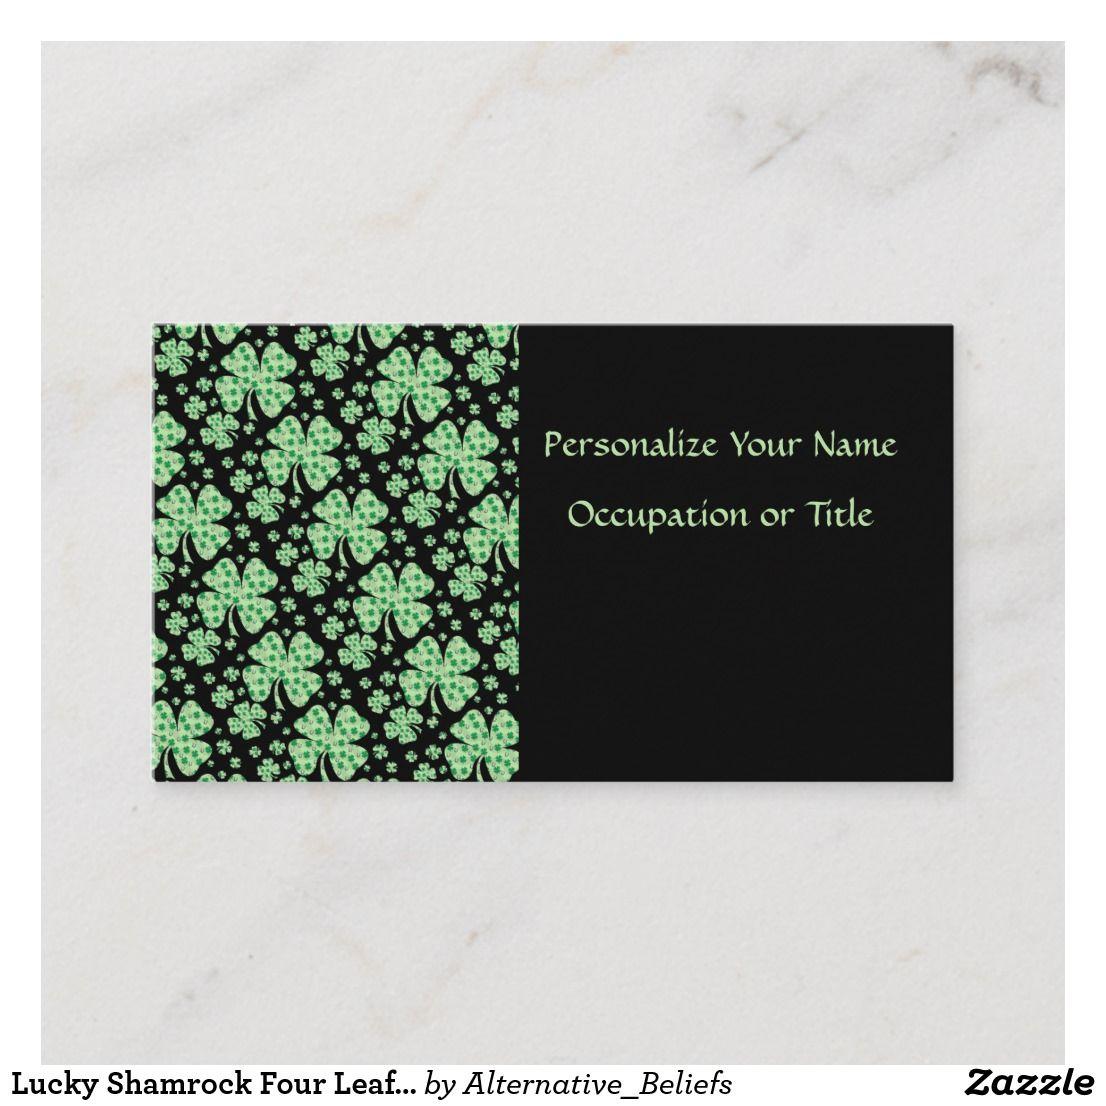 4diy Business Card Organization Business Card Organizer Diy Business Cards Diy Business